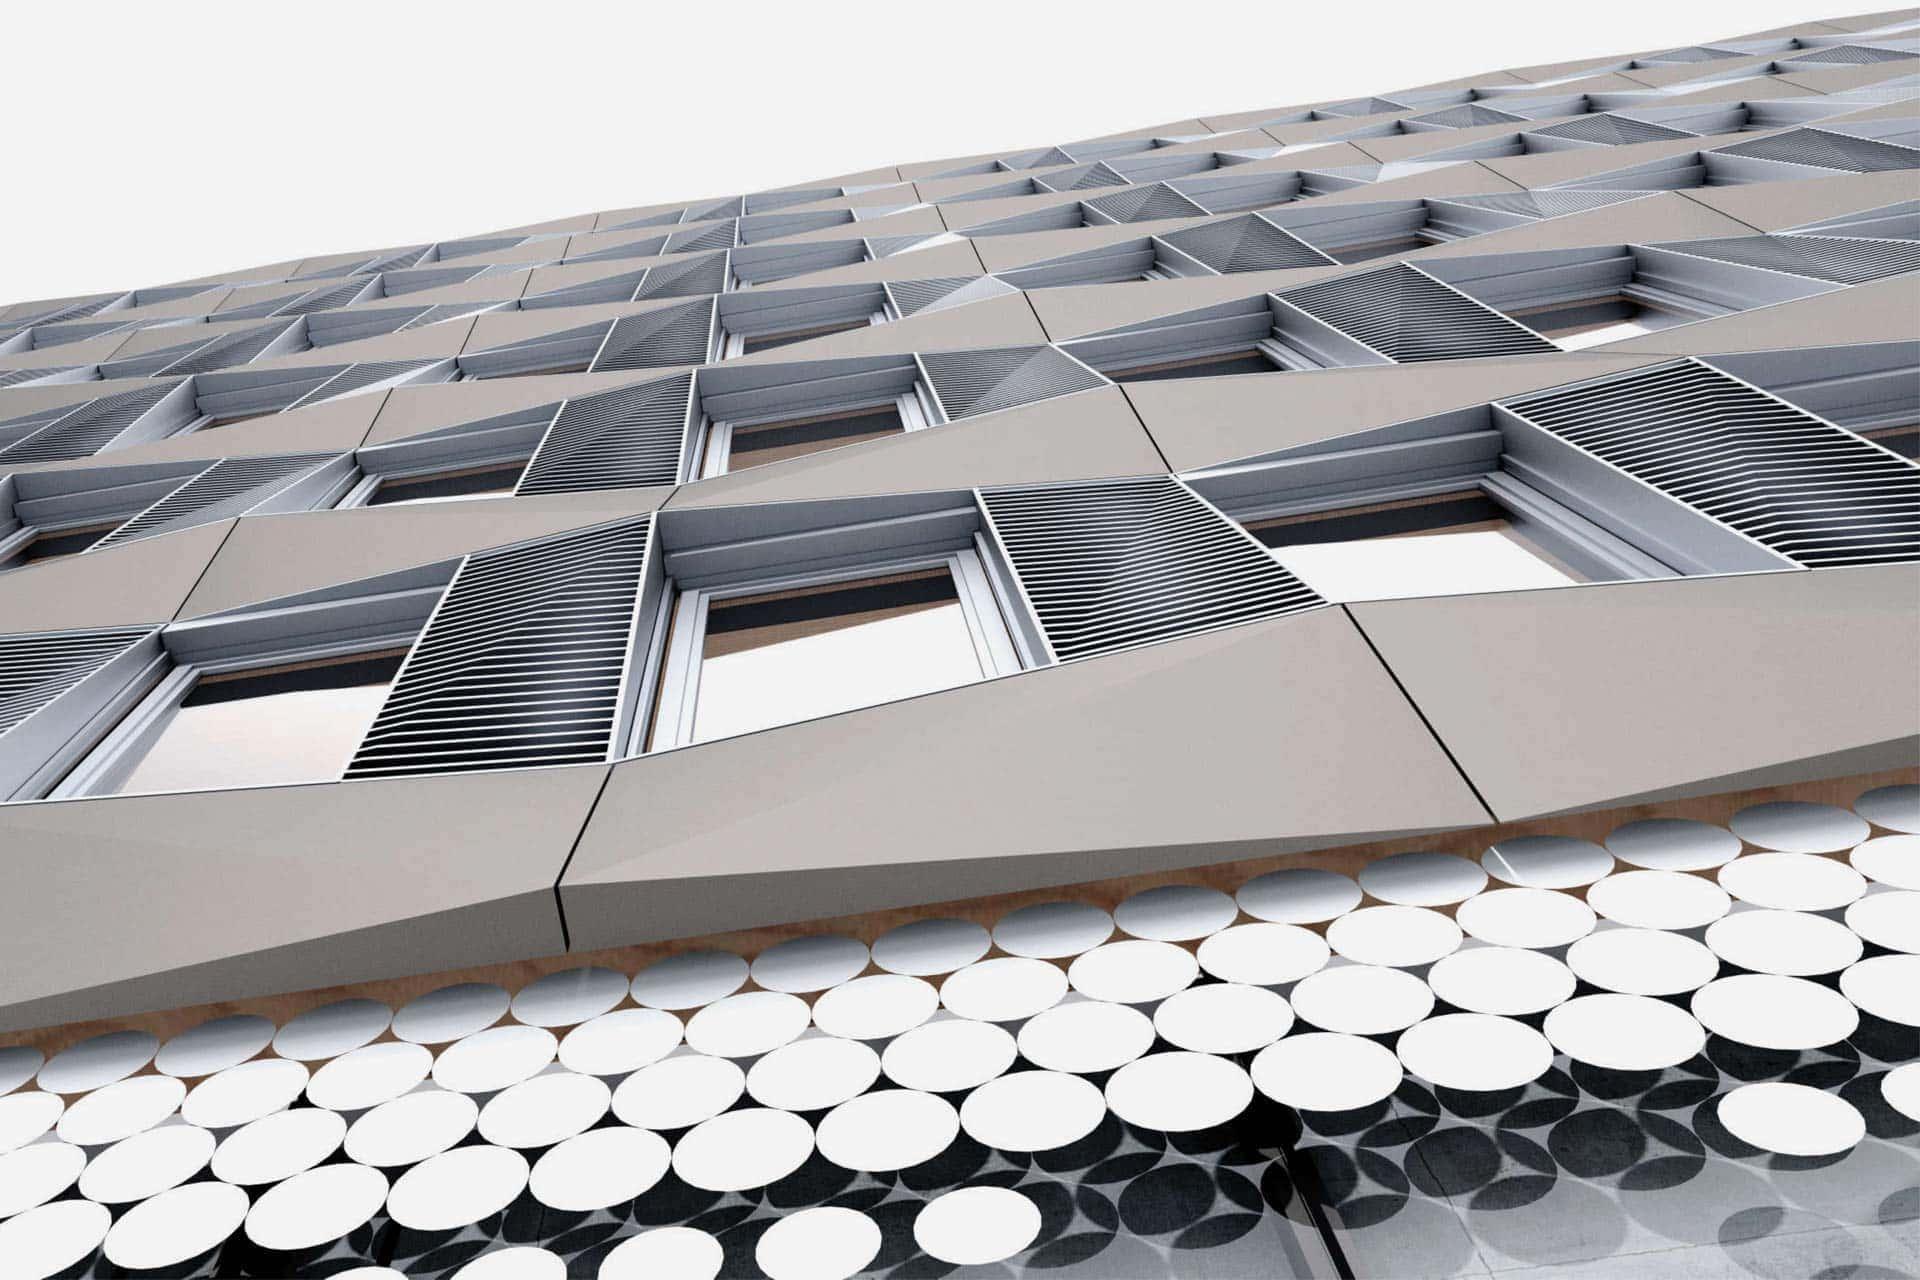 Landratsamt-Rosenheim-Sanierung, Fassade, Aldinger Architekten